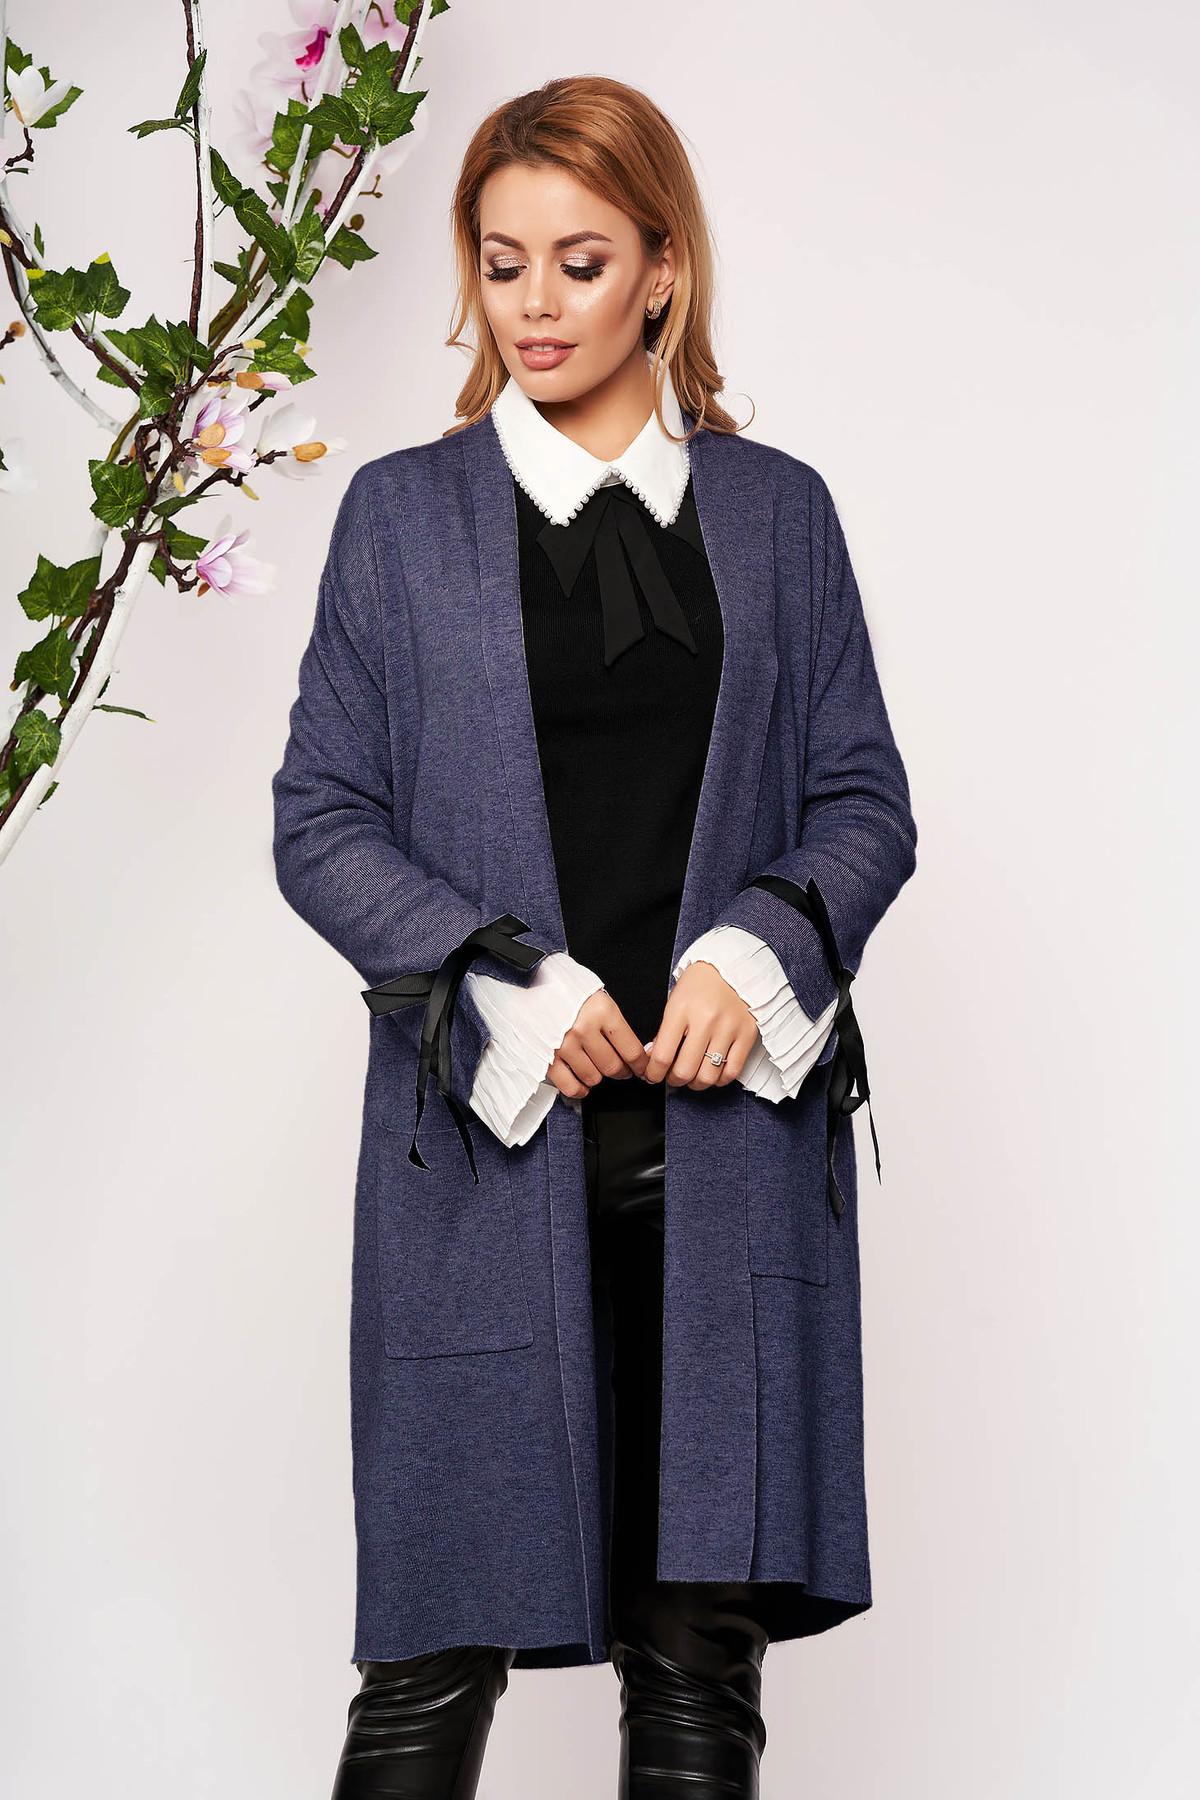 Cardigan SunShine albastru elegant lung tricotat accesorizat cu fundite fara captuseala cu buzunare in fata